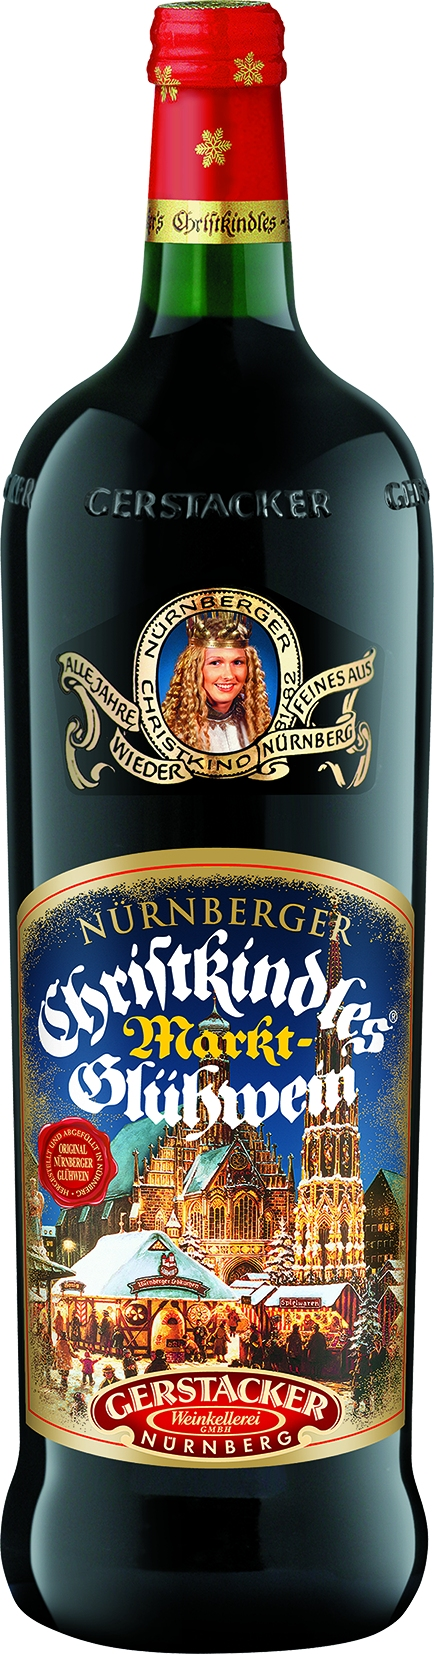 Nuernberger Christkindl Gluehwein